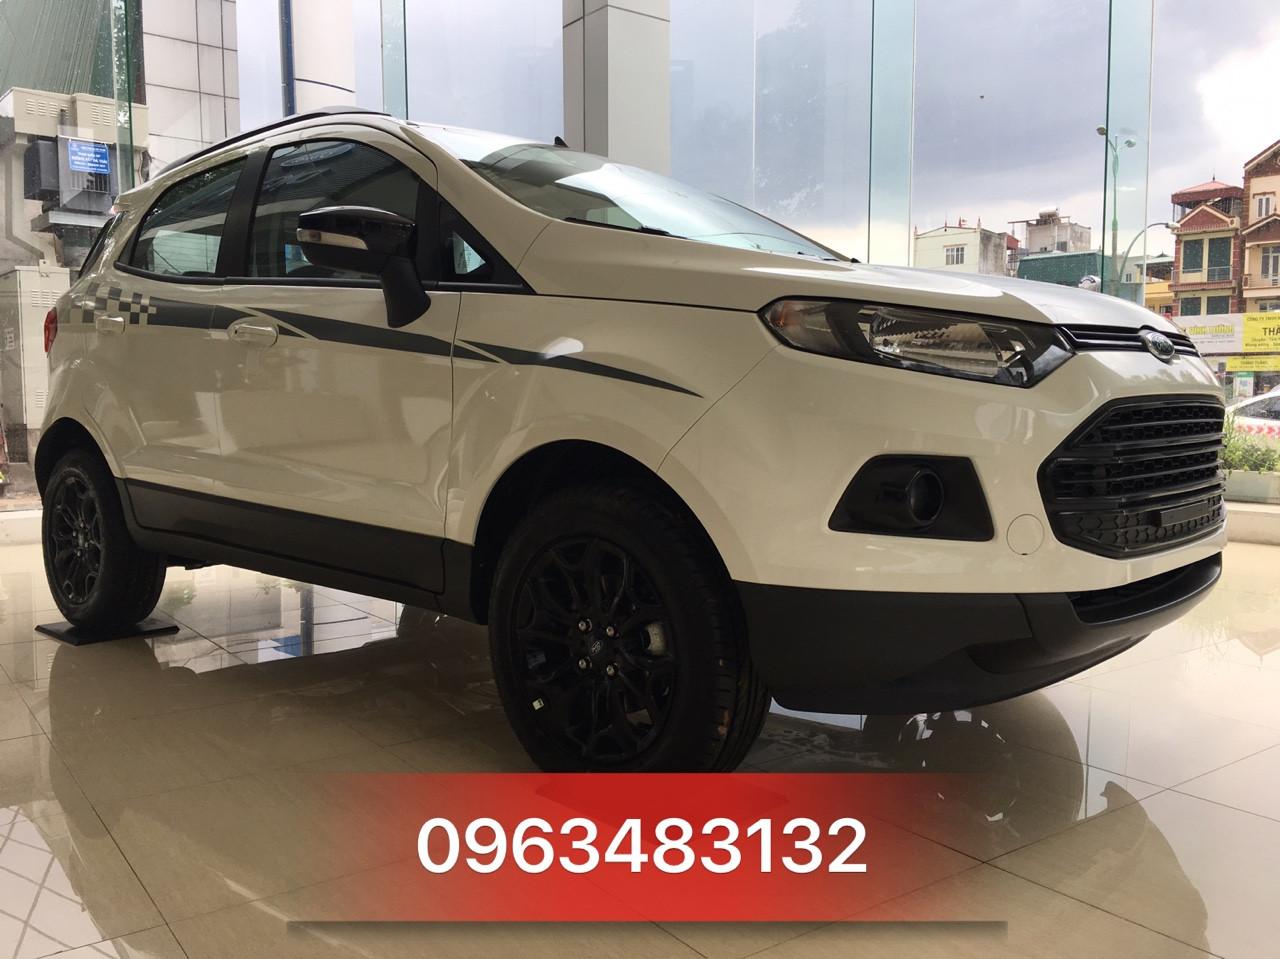 Ford Ecosport Black Edition SVP